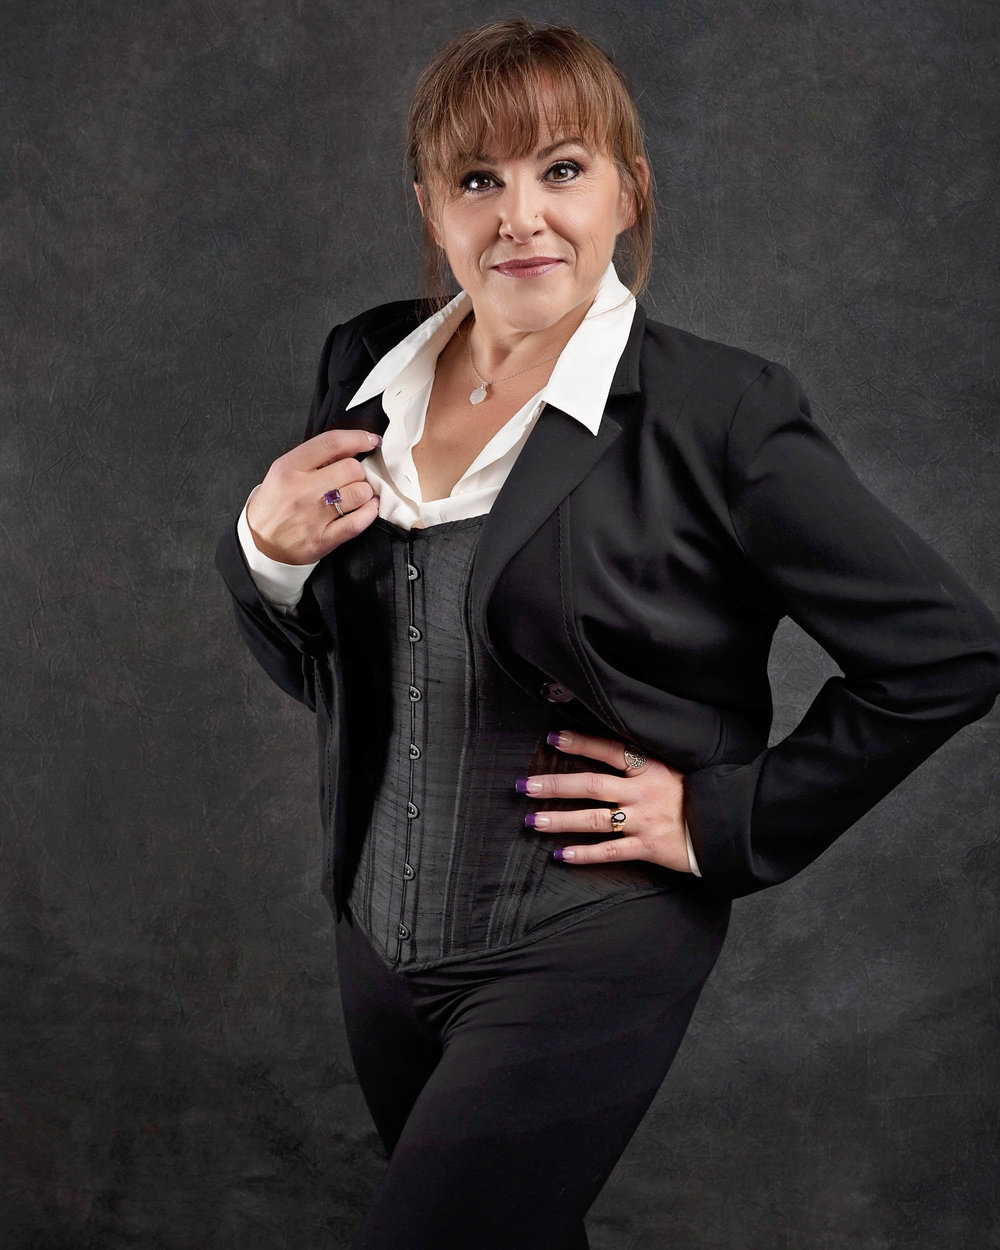 Sexy-Business-Corset.jpg